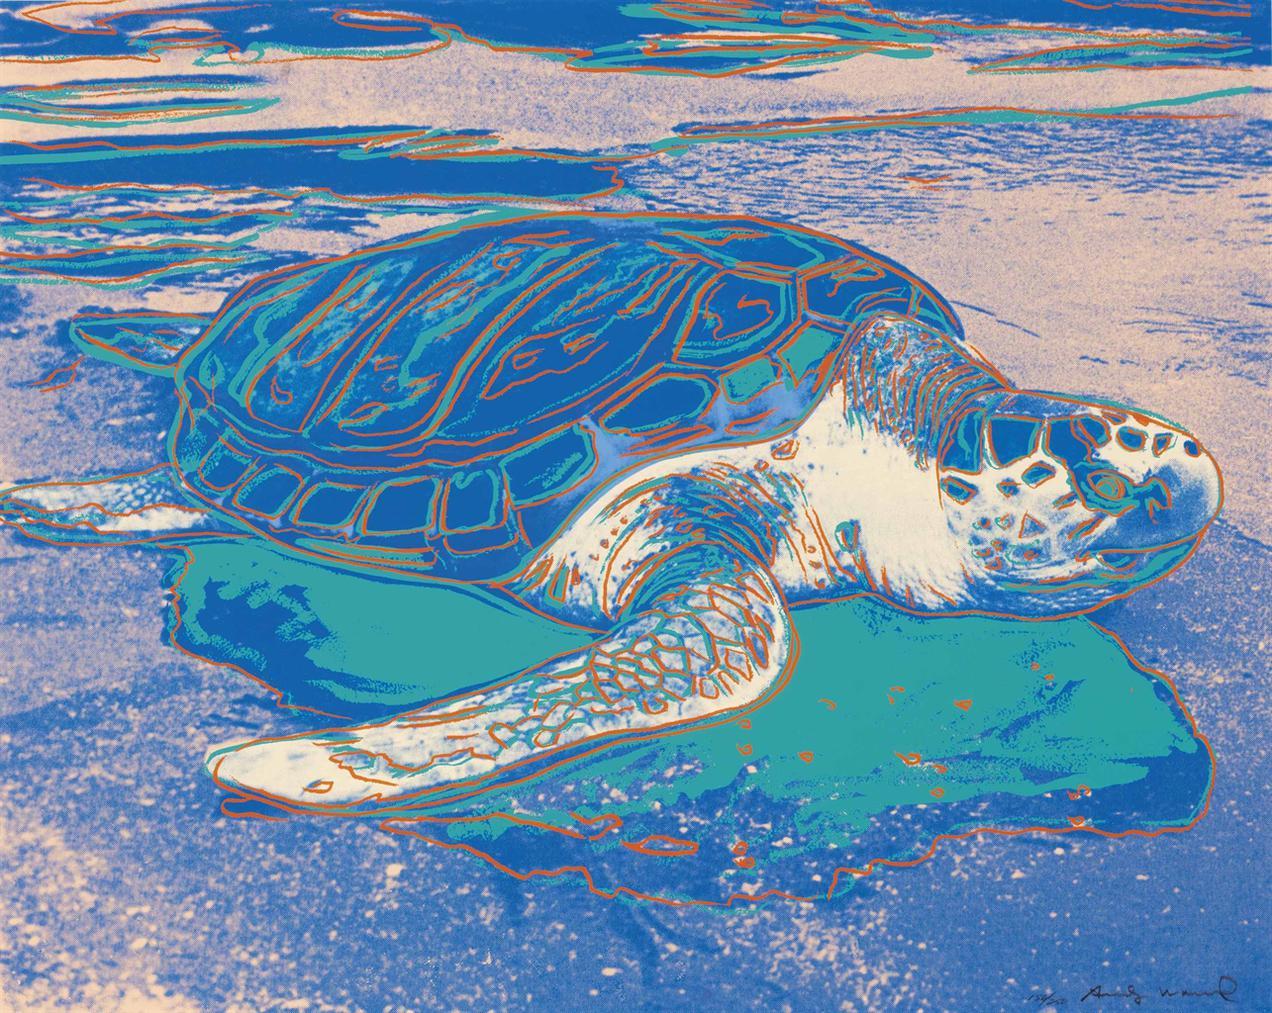 Andy Warhol-Turtle-1985